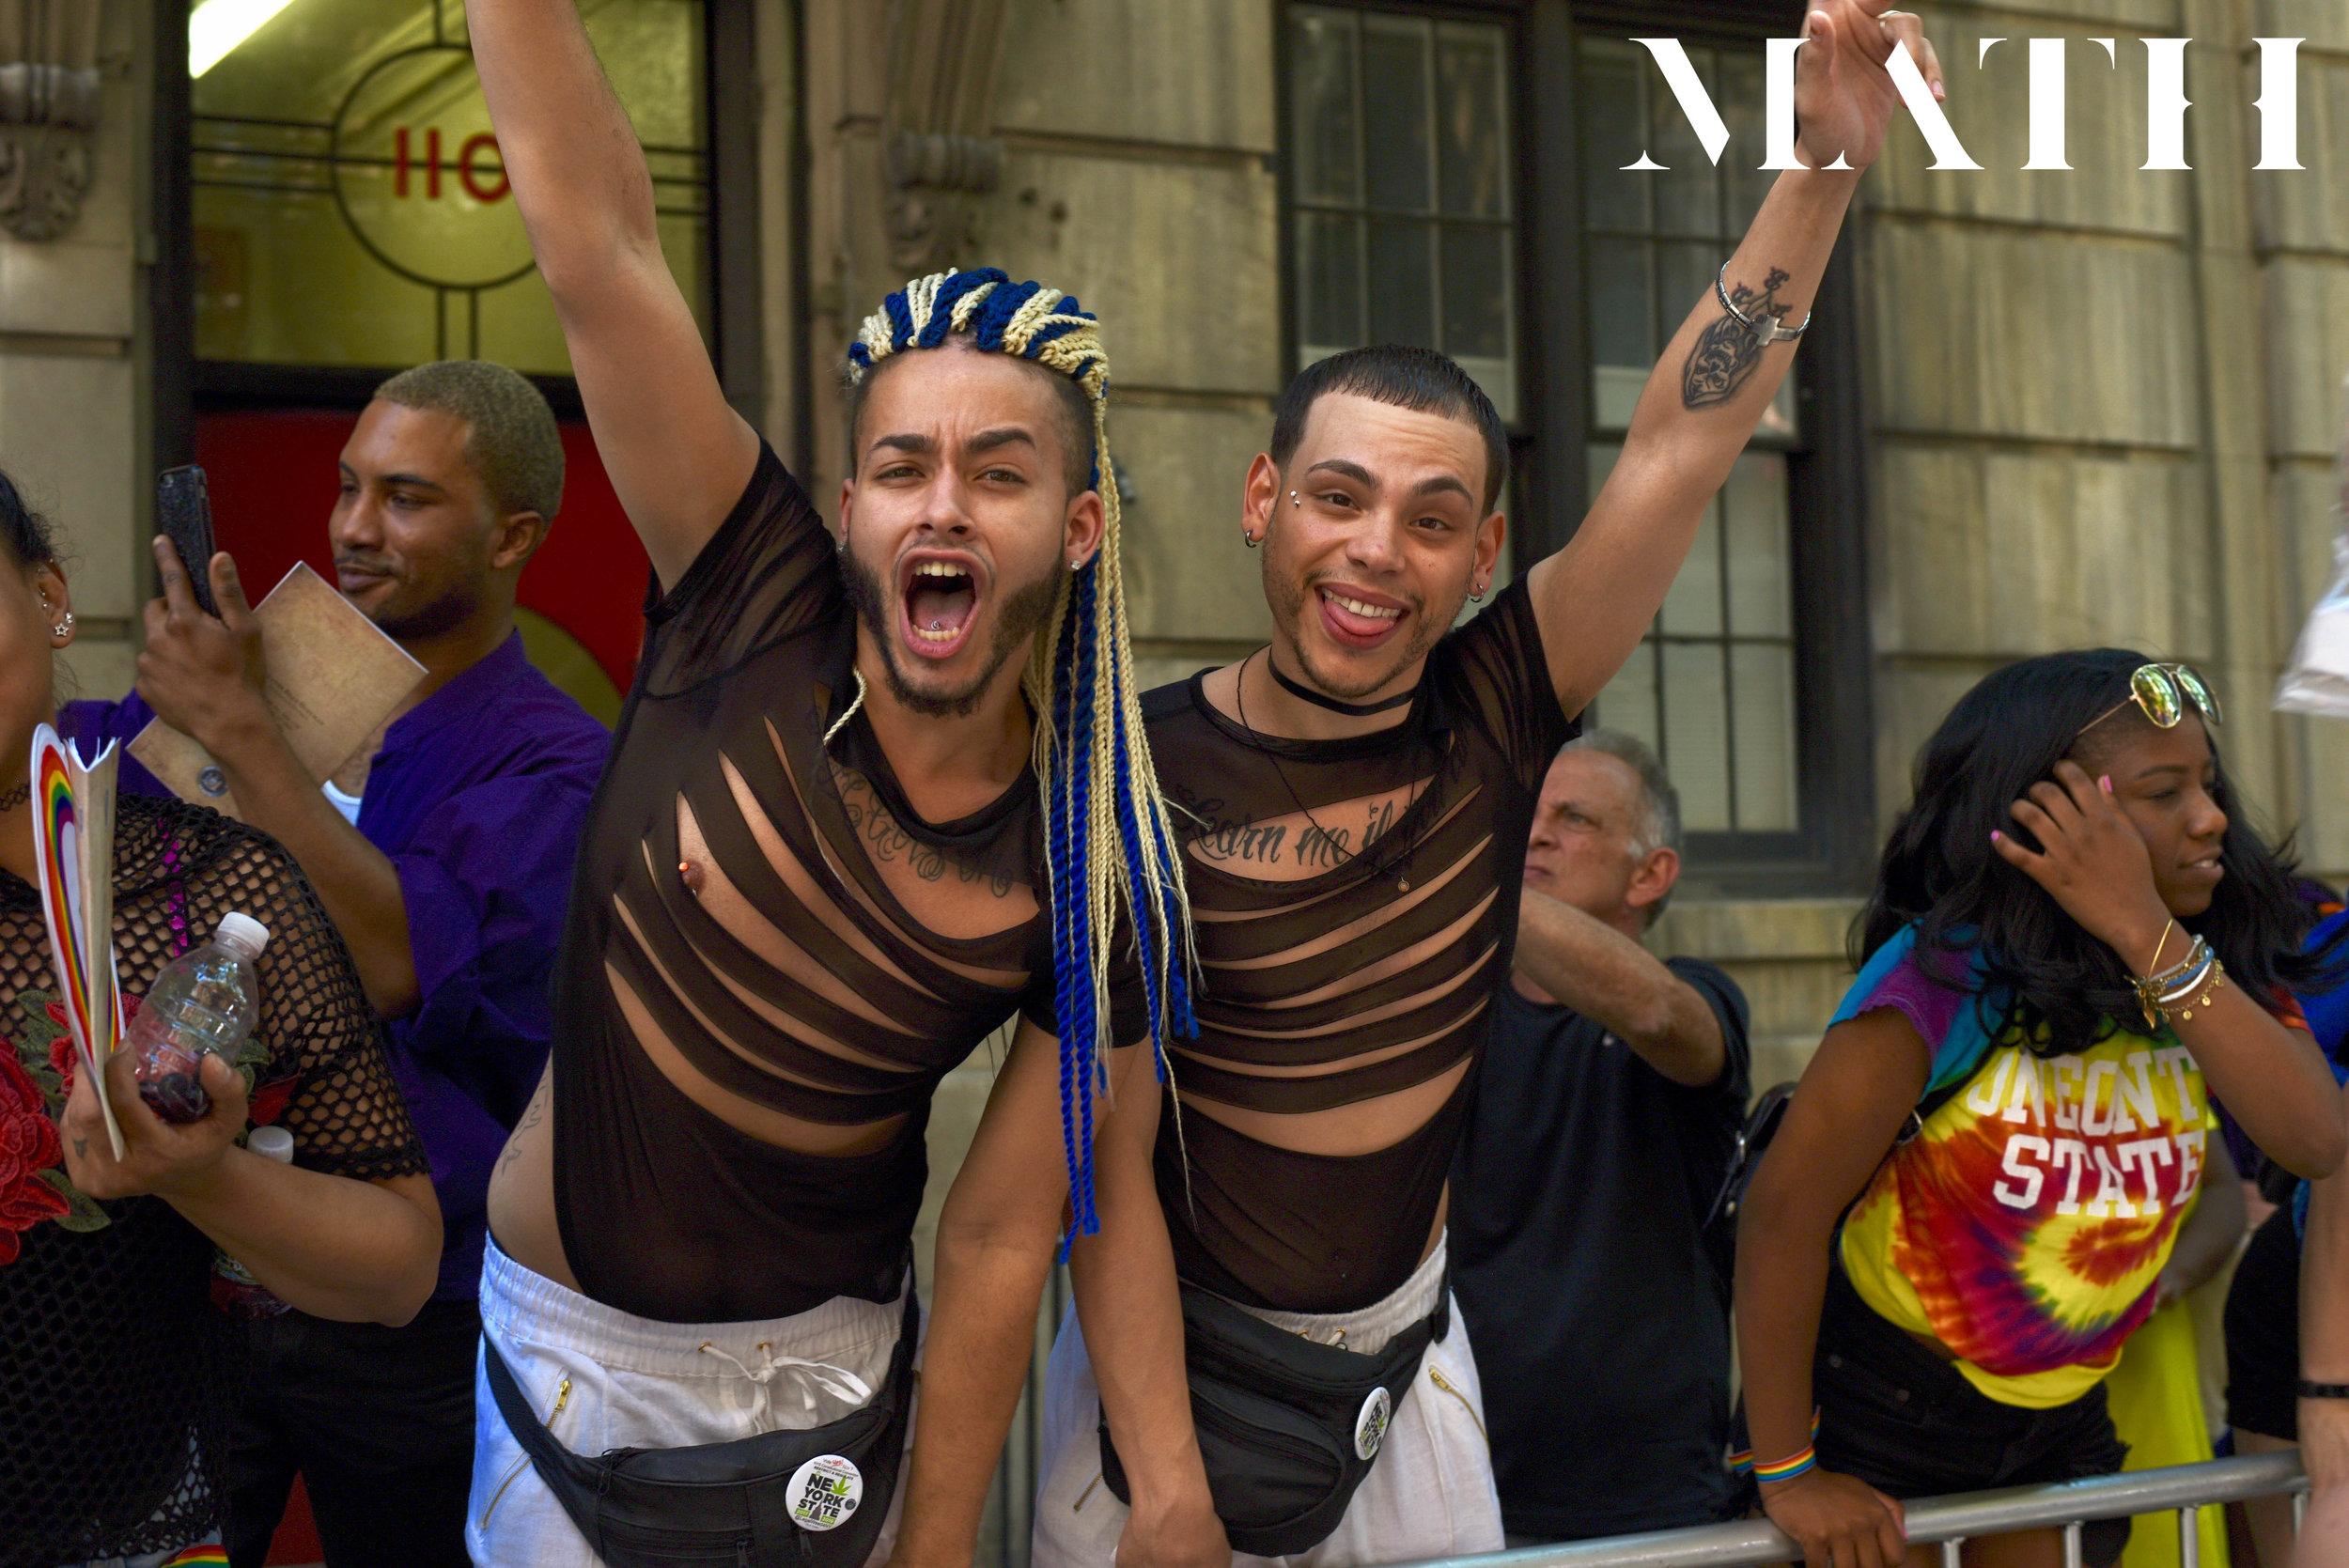 NYC Pride_Ginger Hollander 18.jpg